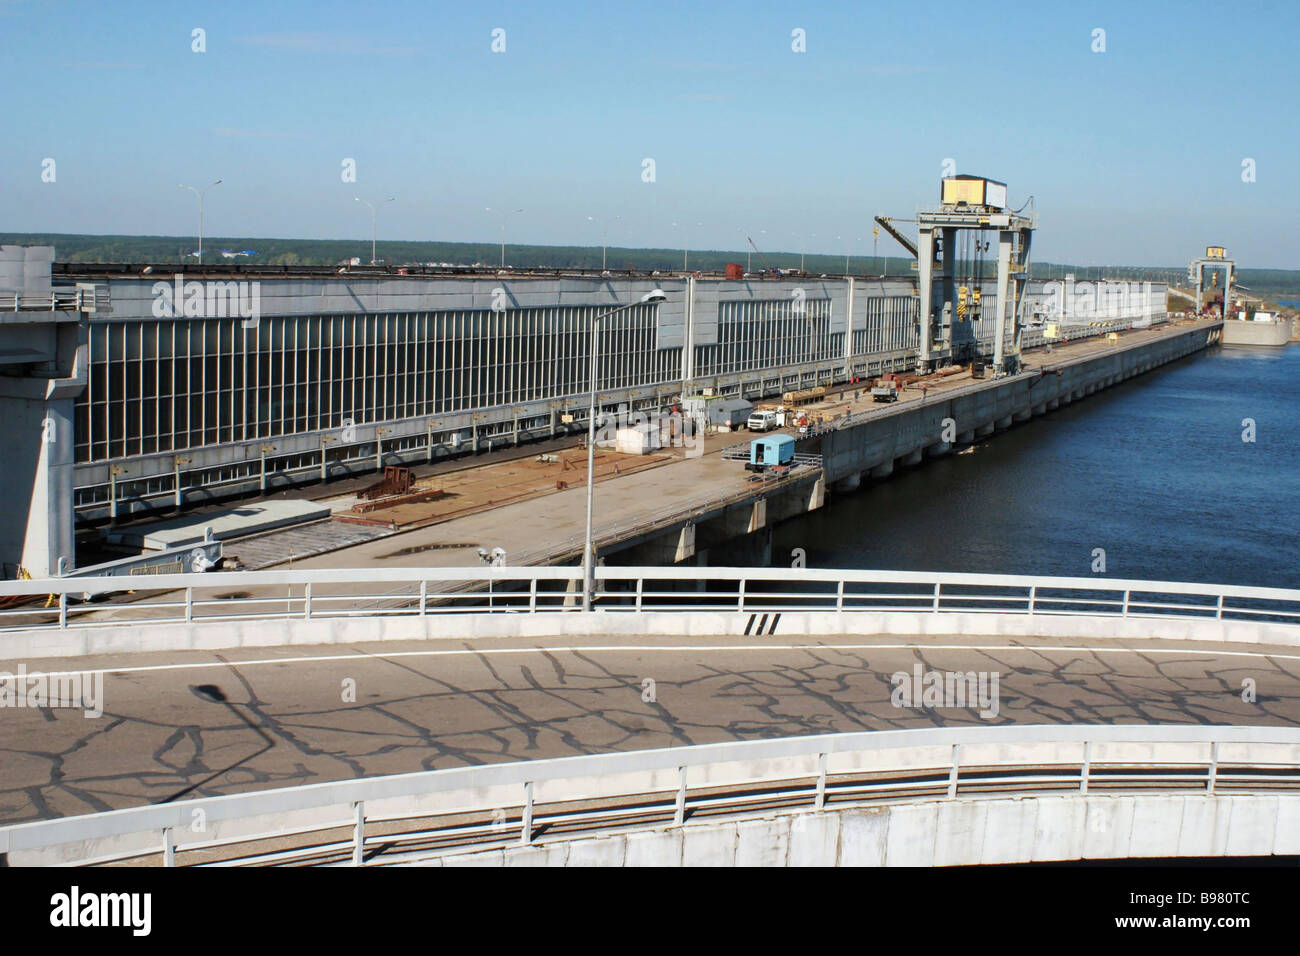 The Nizhnekamsk hydro electric station - Stock Image